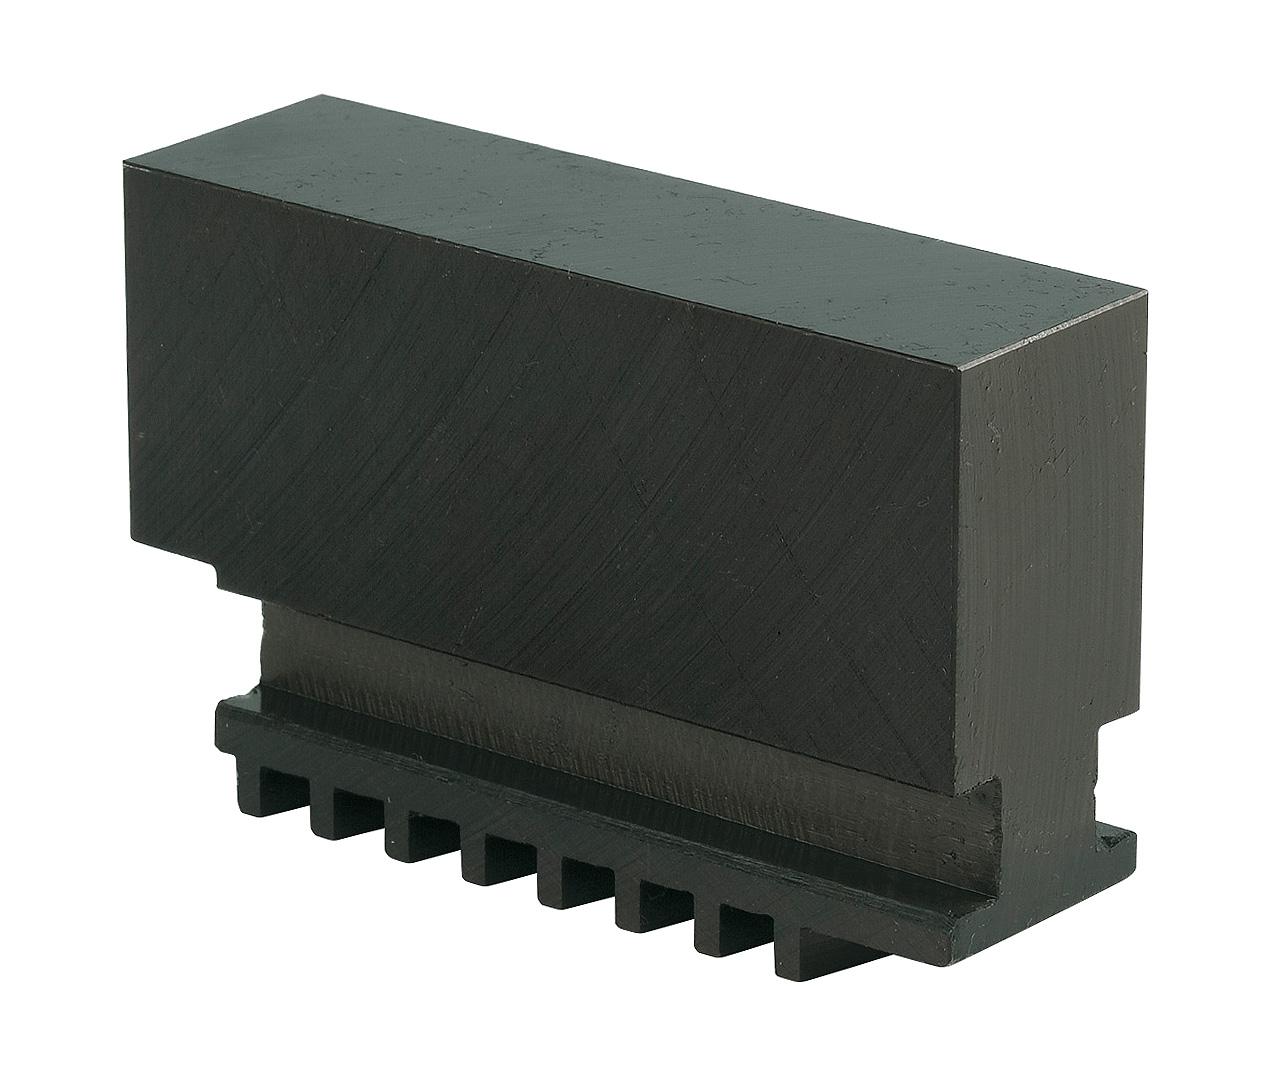 Szczęki jednolite miękkie - komplet SJ-PS3-500 BERNARDO